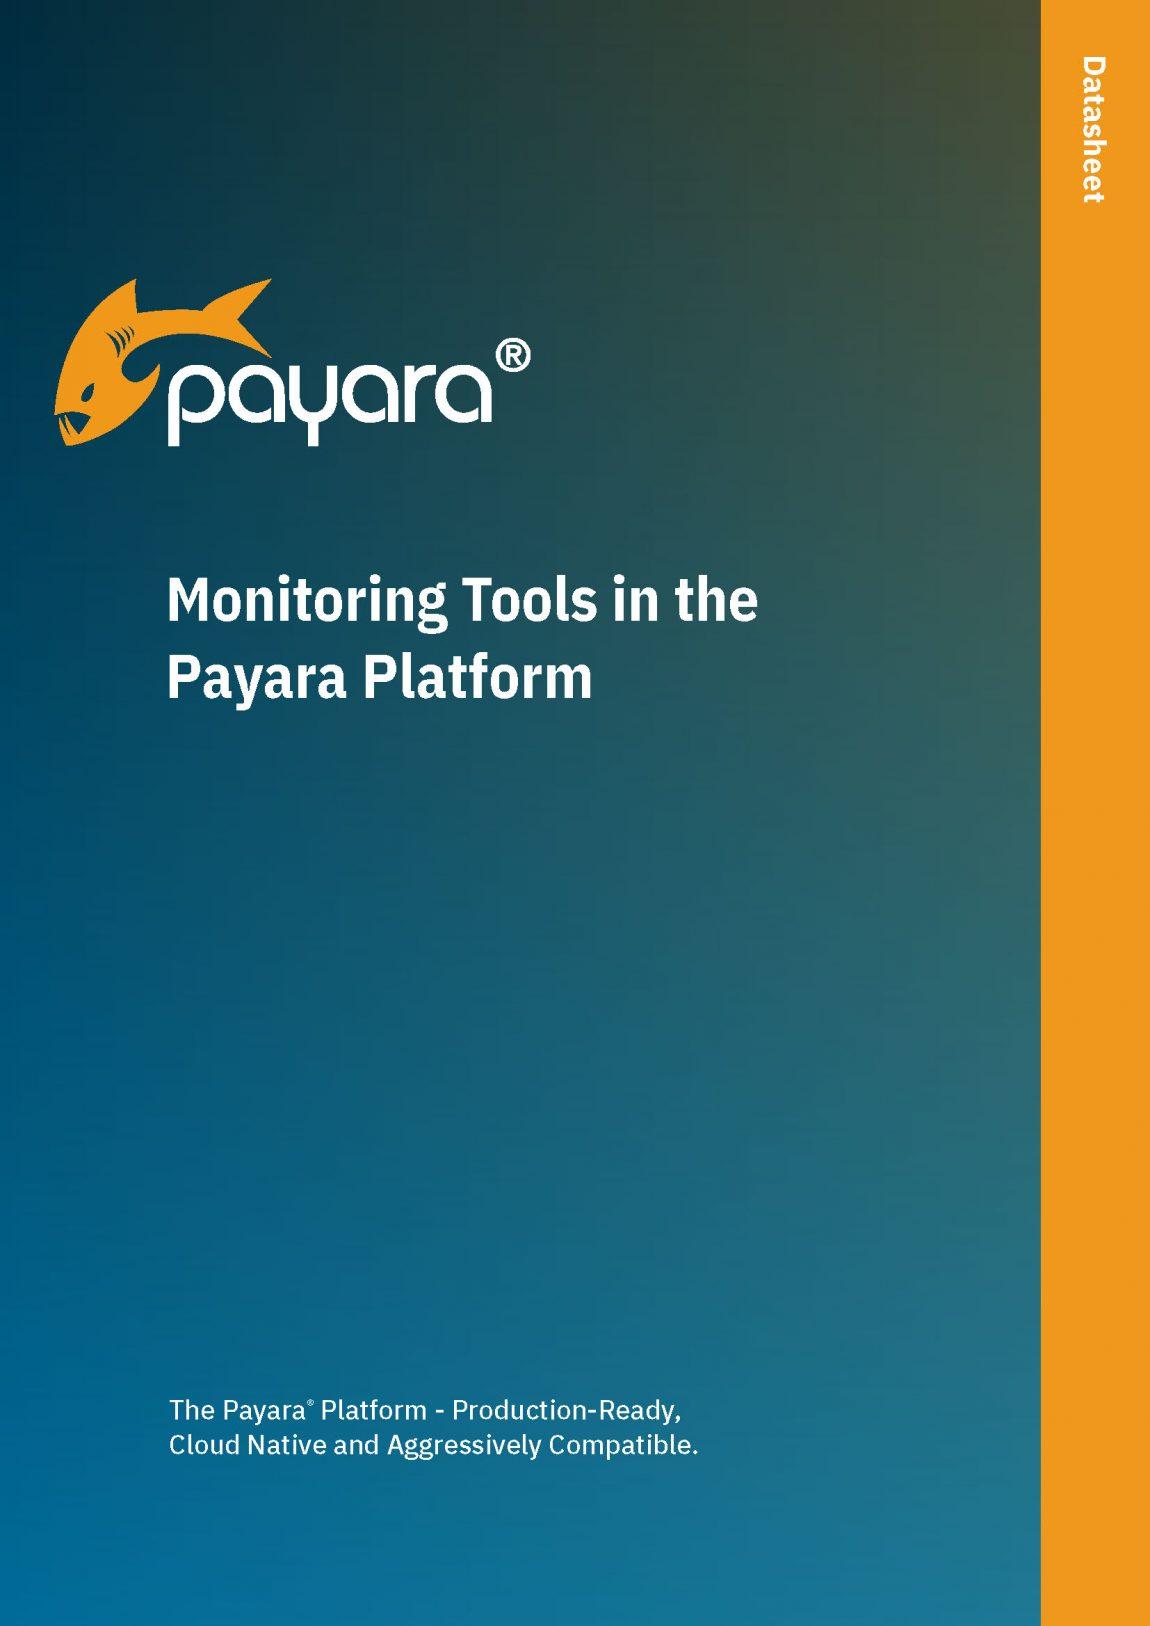 Monitoring Tools in the Payara Platform